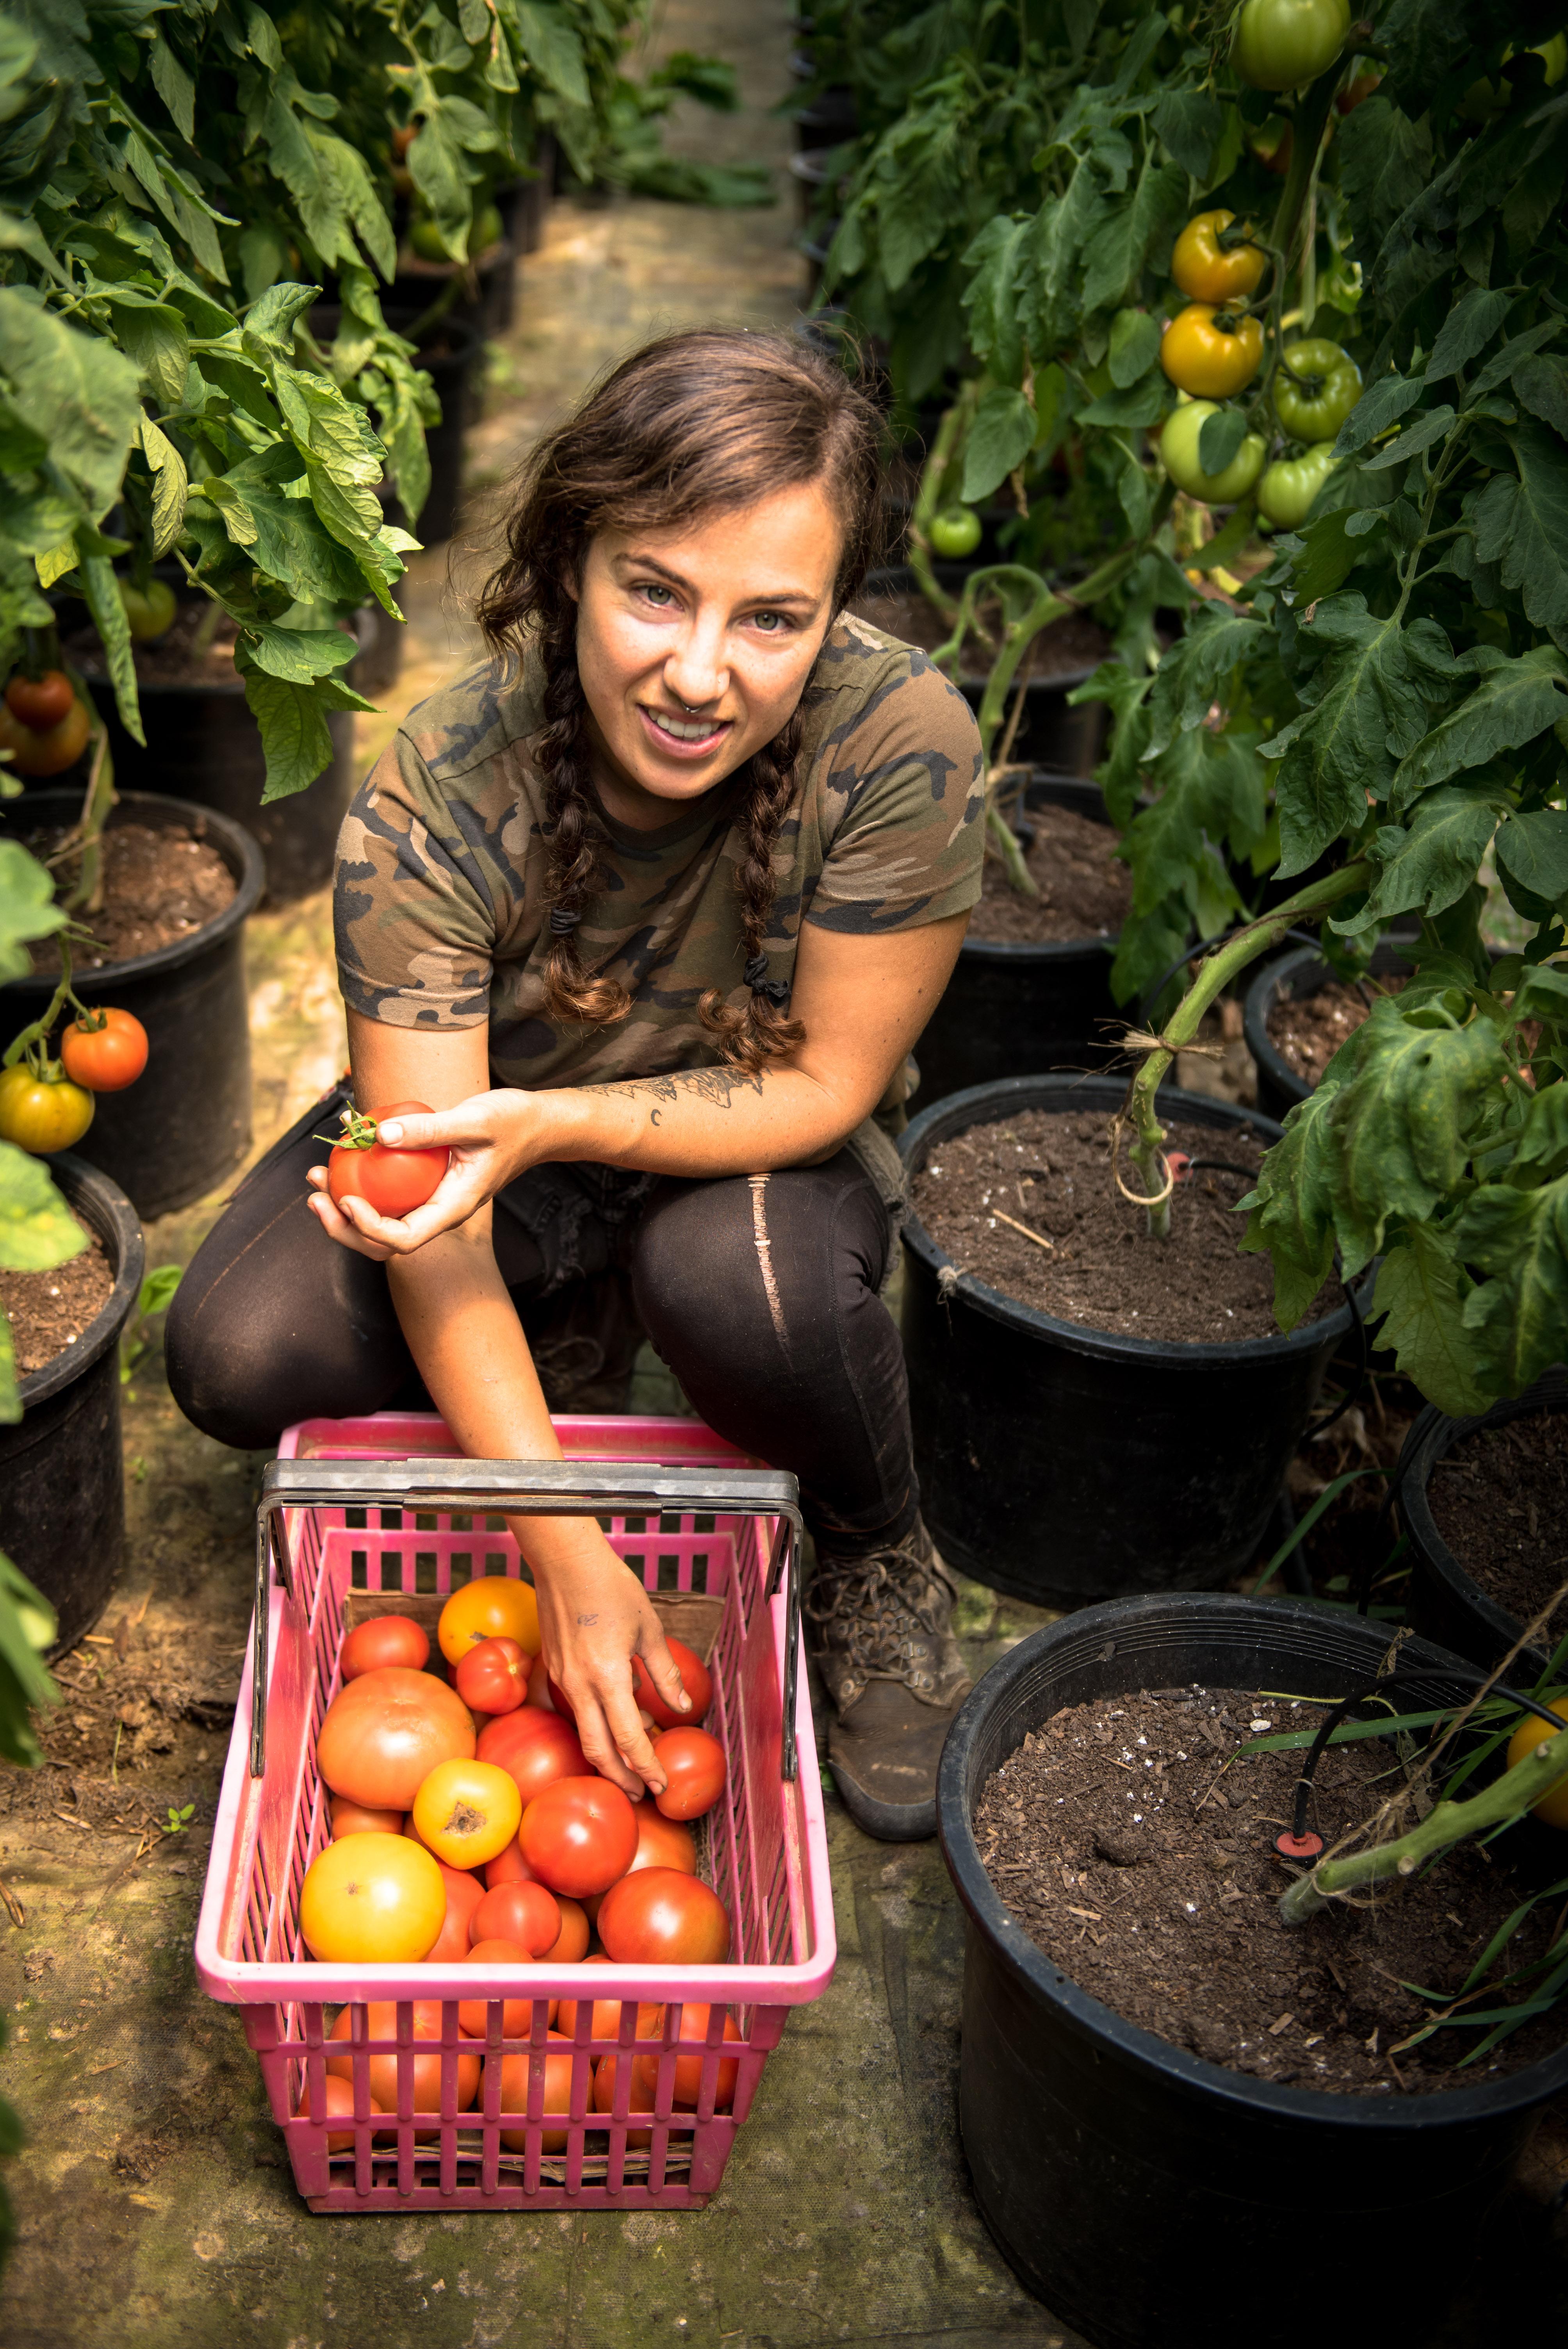 Maine Tomatoes